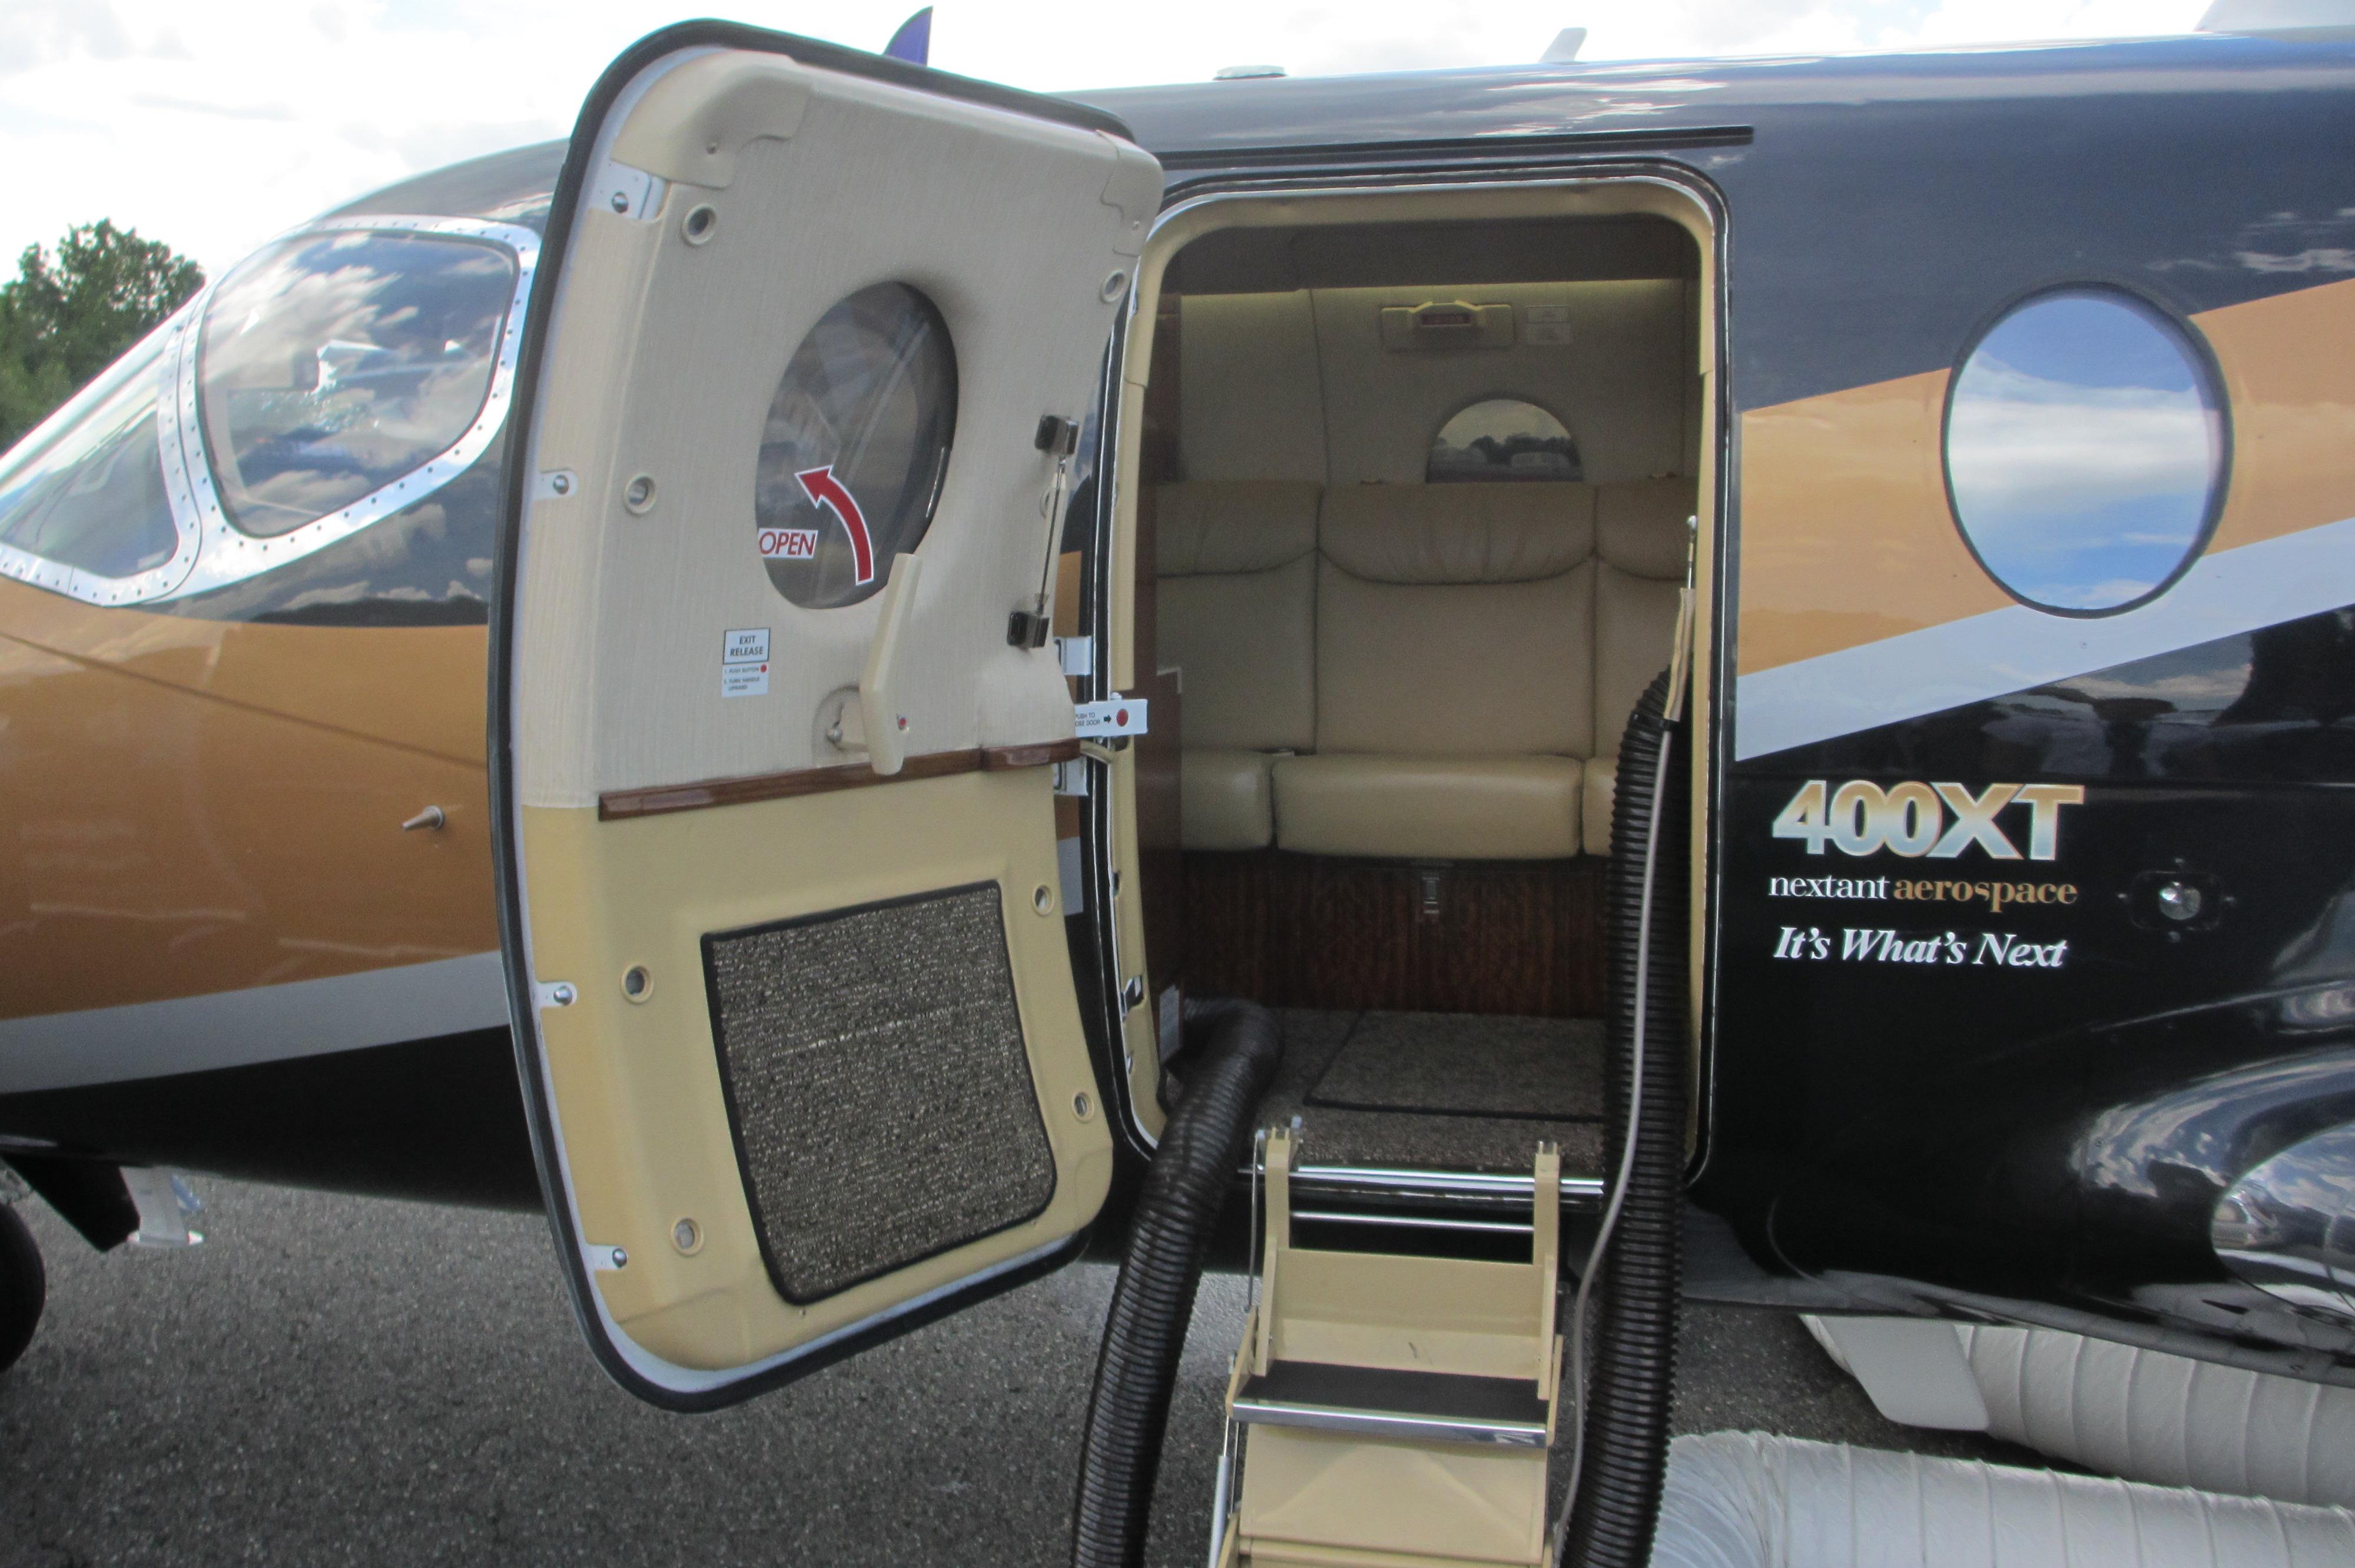 FileNextant 400XT exterior door.jpg & File:Nextant 400XT exterior door.jpg - Wikimedia Commons pezcame.com